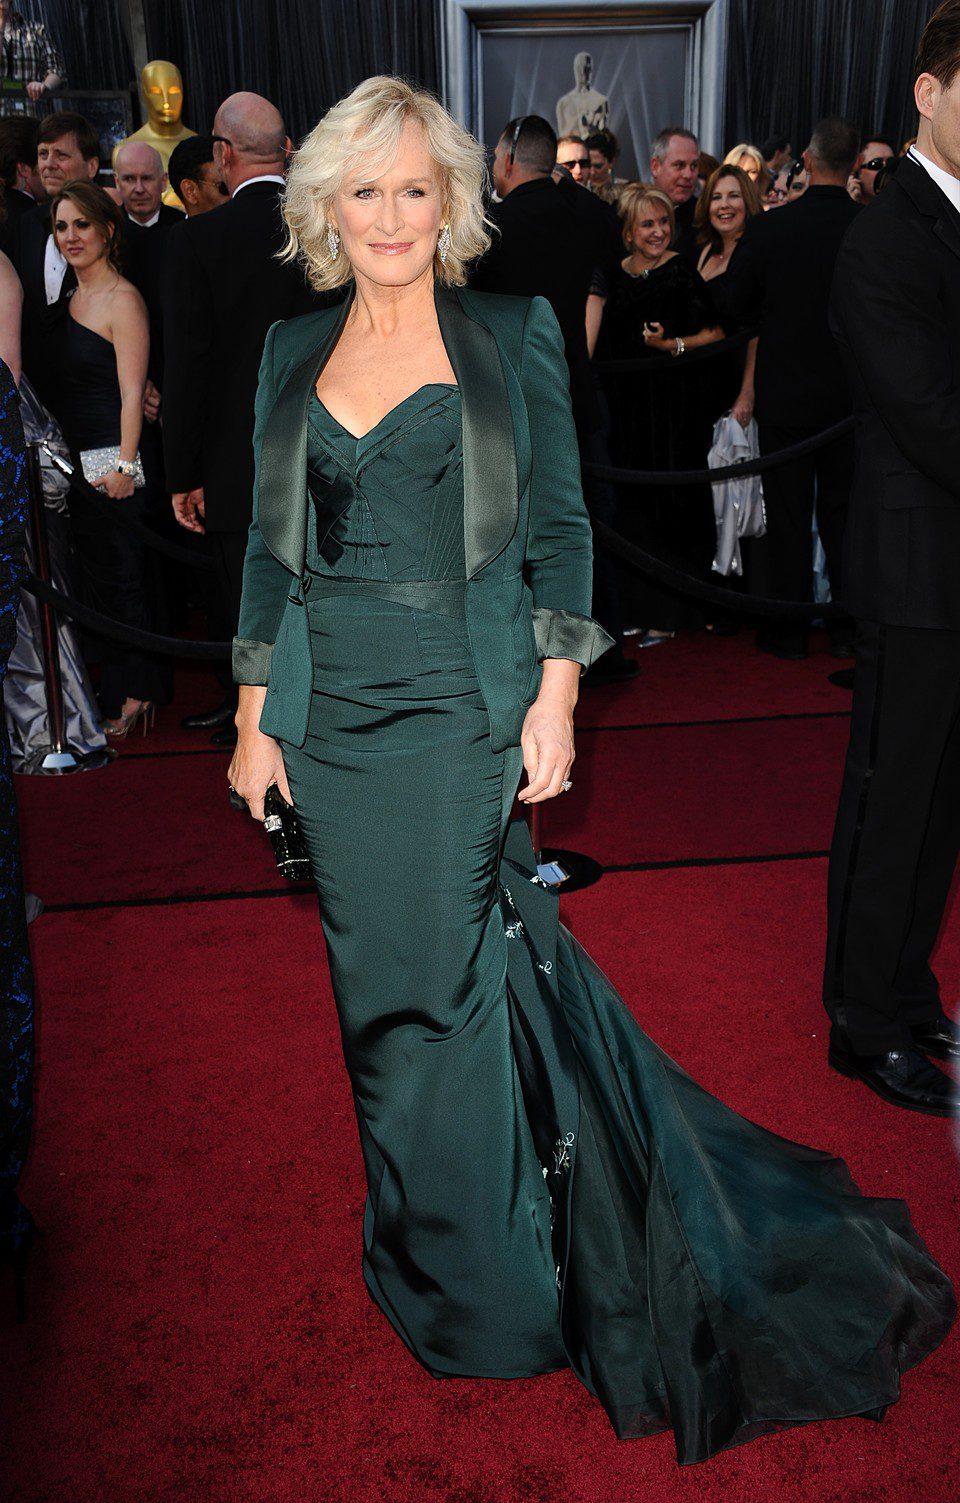 Glenn Close en la alfombra roja de los Oscar 2012